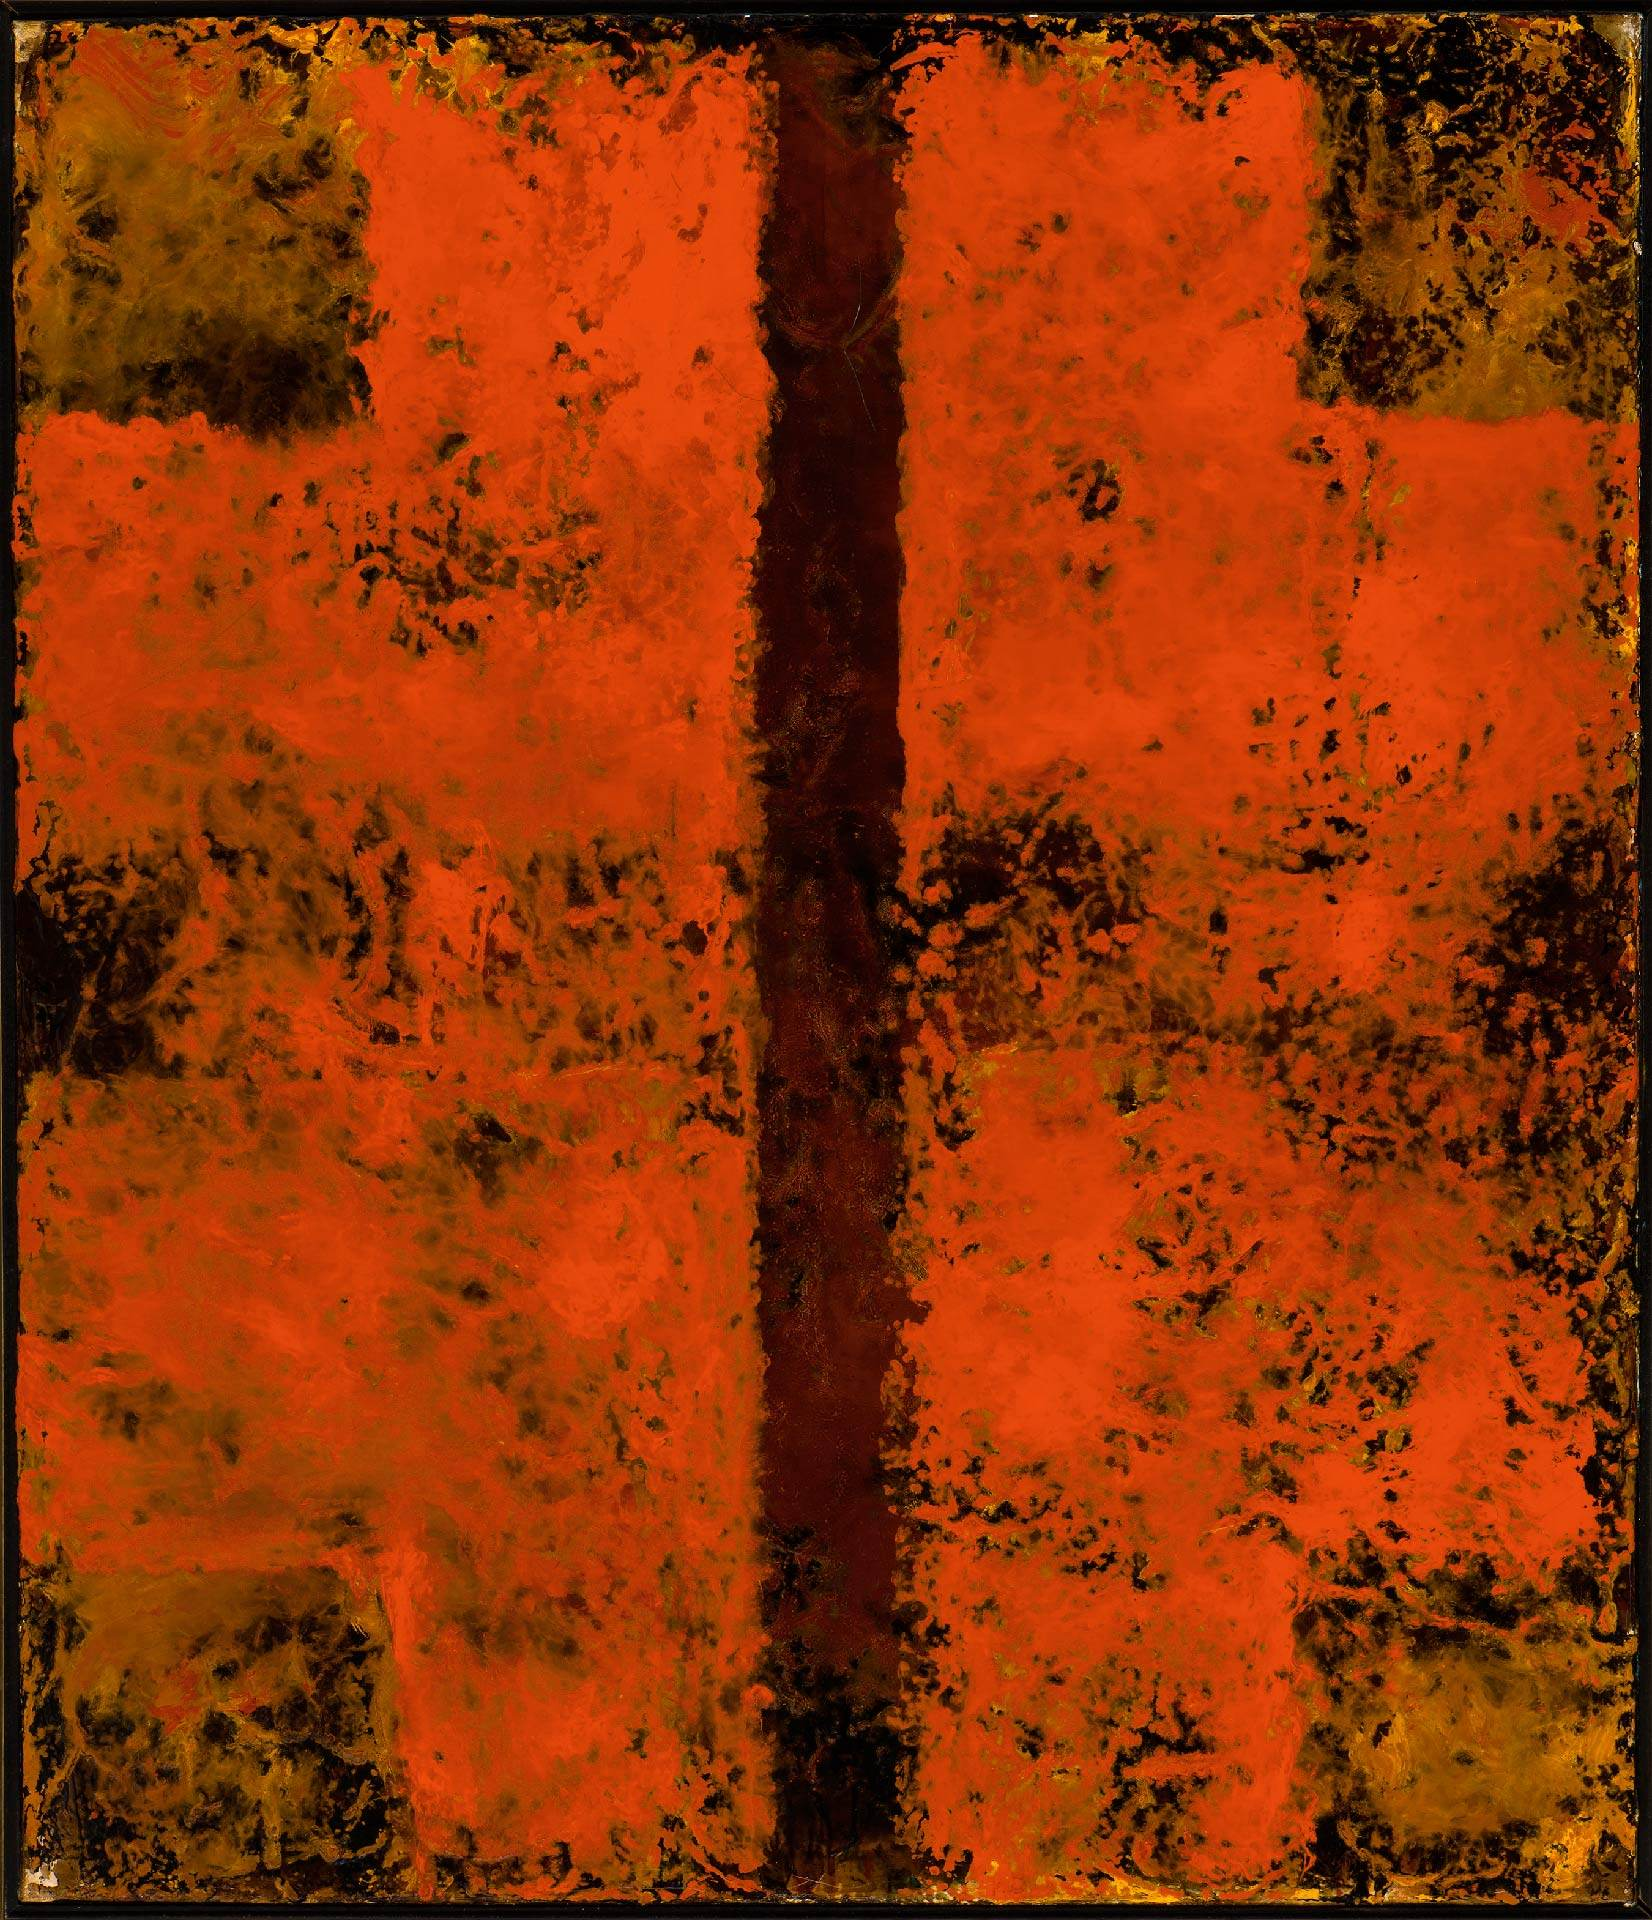 Jean McEwen (1923-1999), Sans titre, 1963 ou 1964